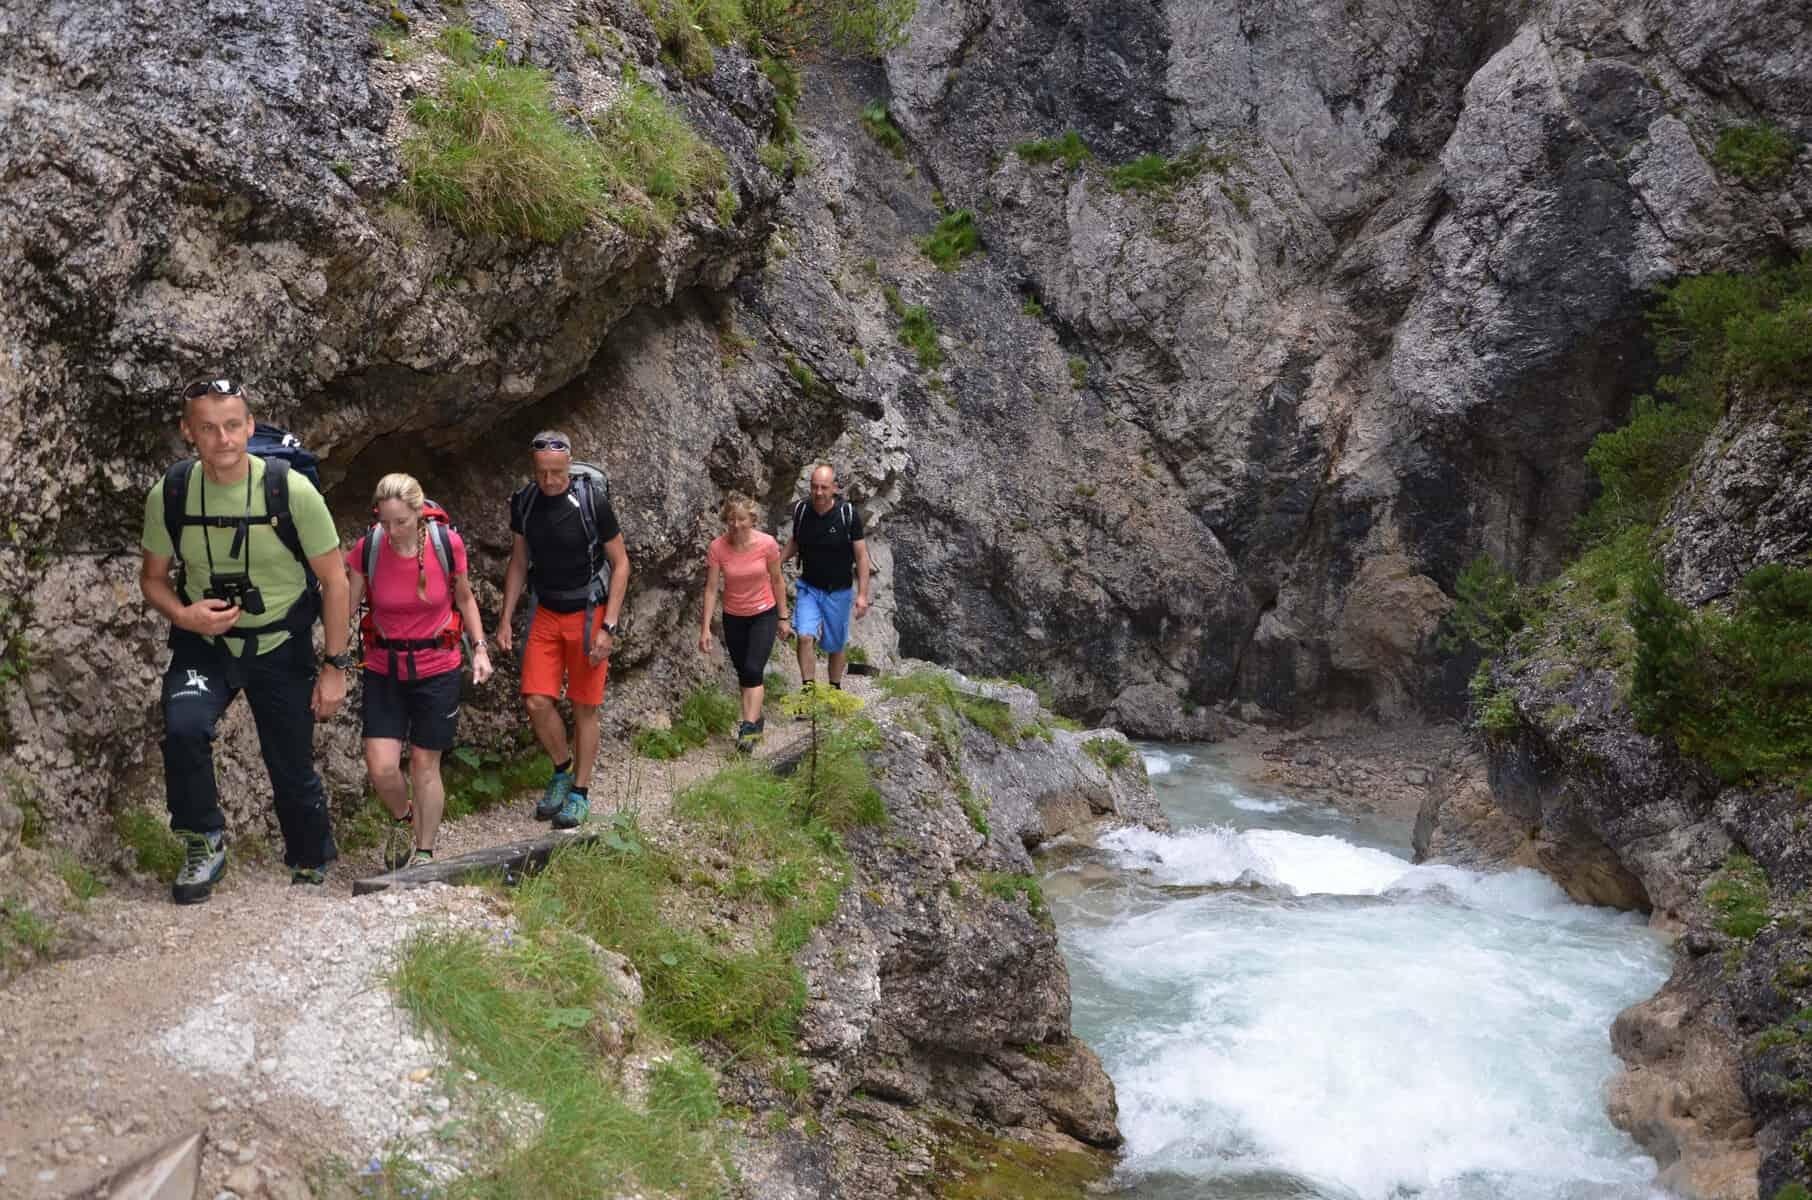 Exkursion: Gleirschklamm - Holz & Trift 139